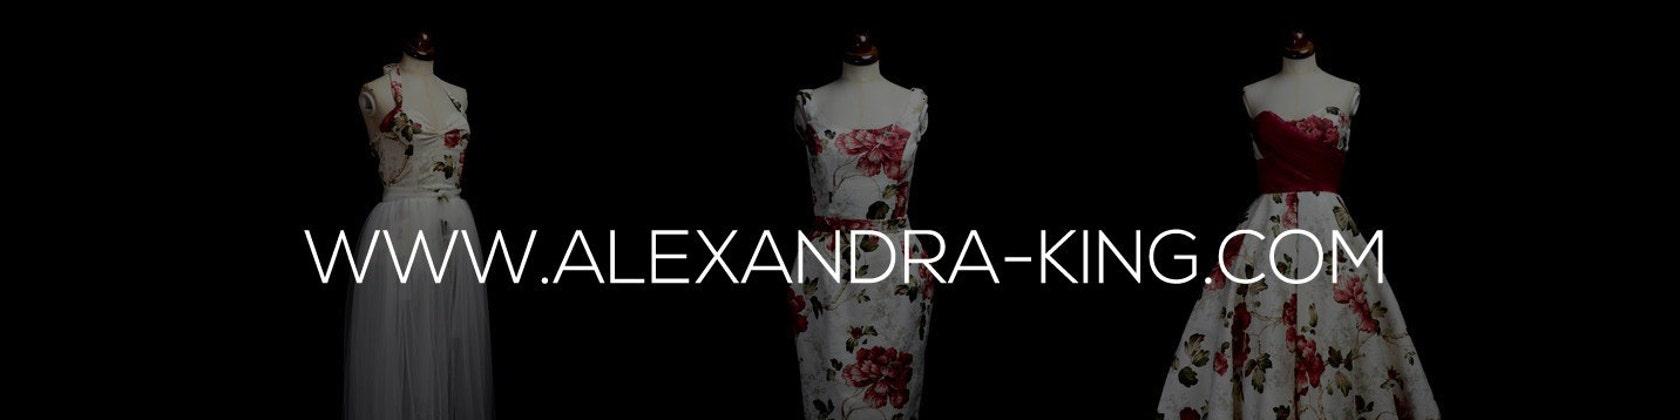 76e309958a5 Old Hollywood Style Dresses. by alexandrakingdesign on Etsy